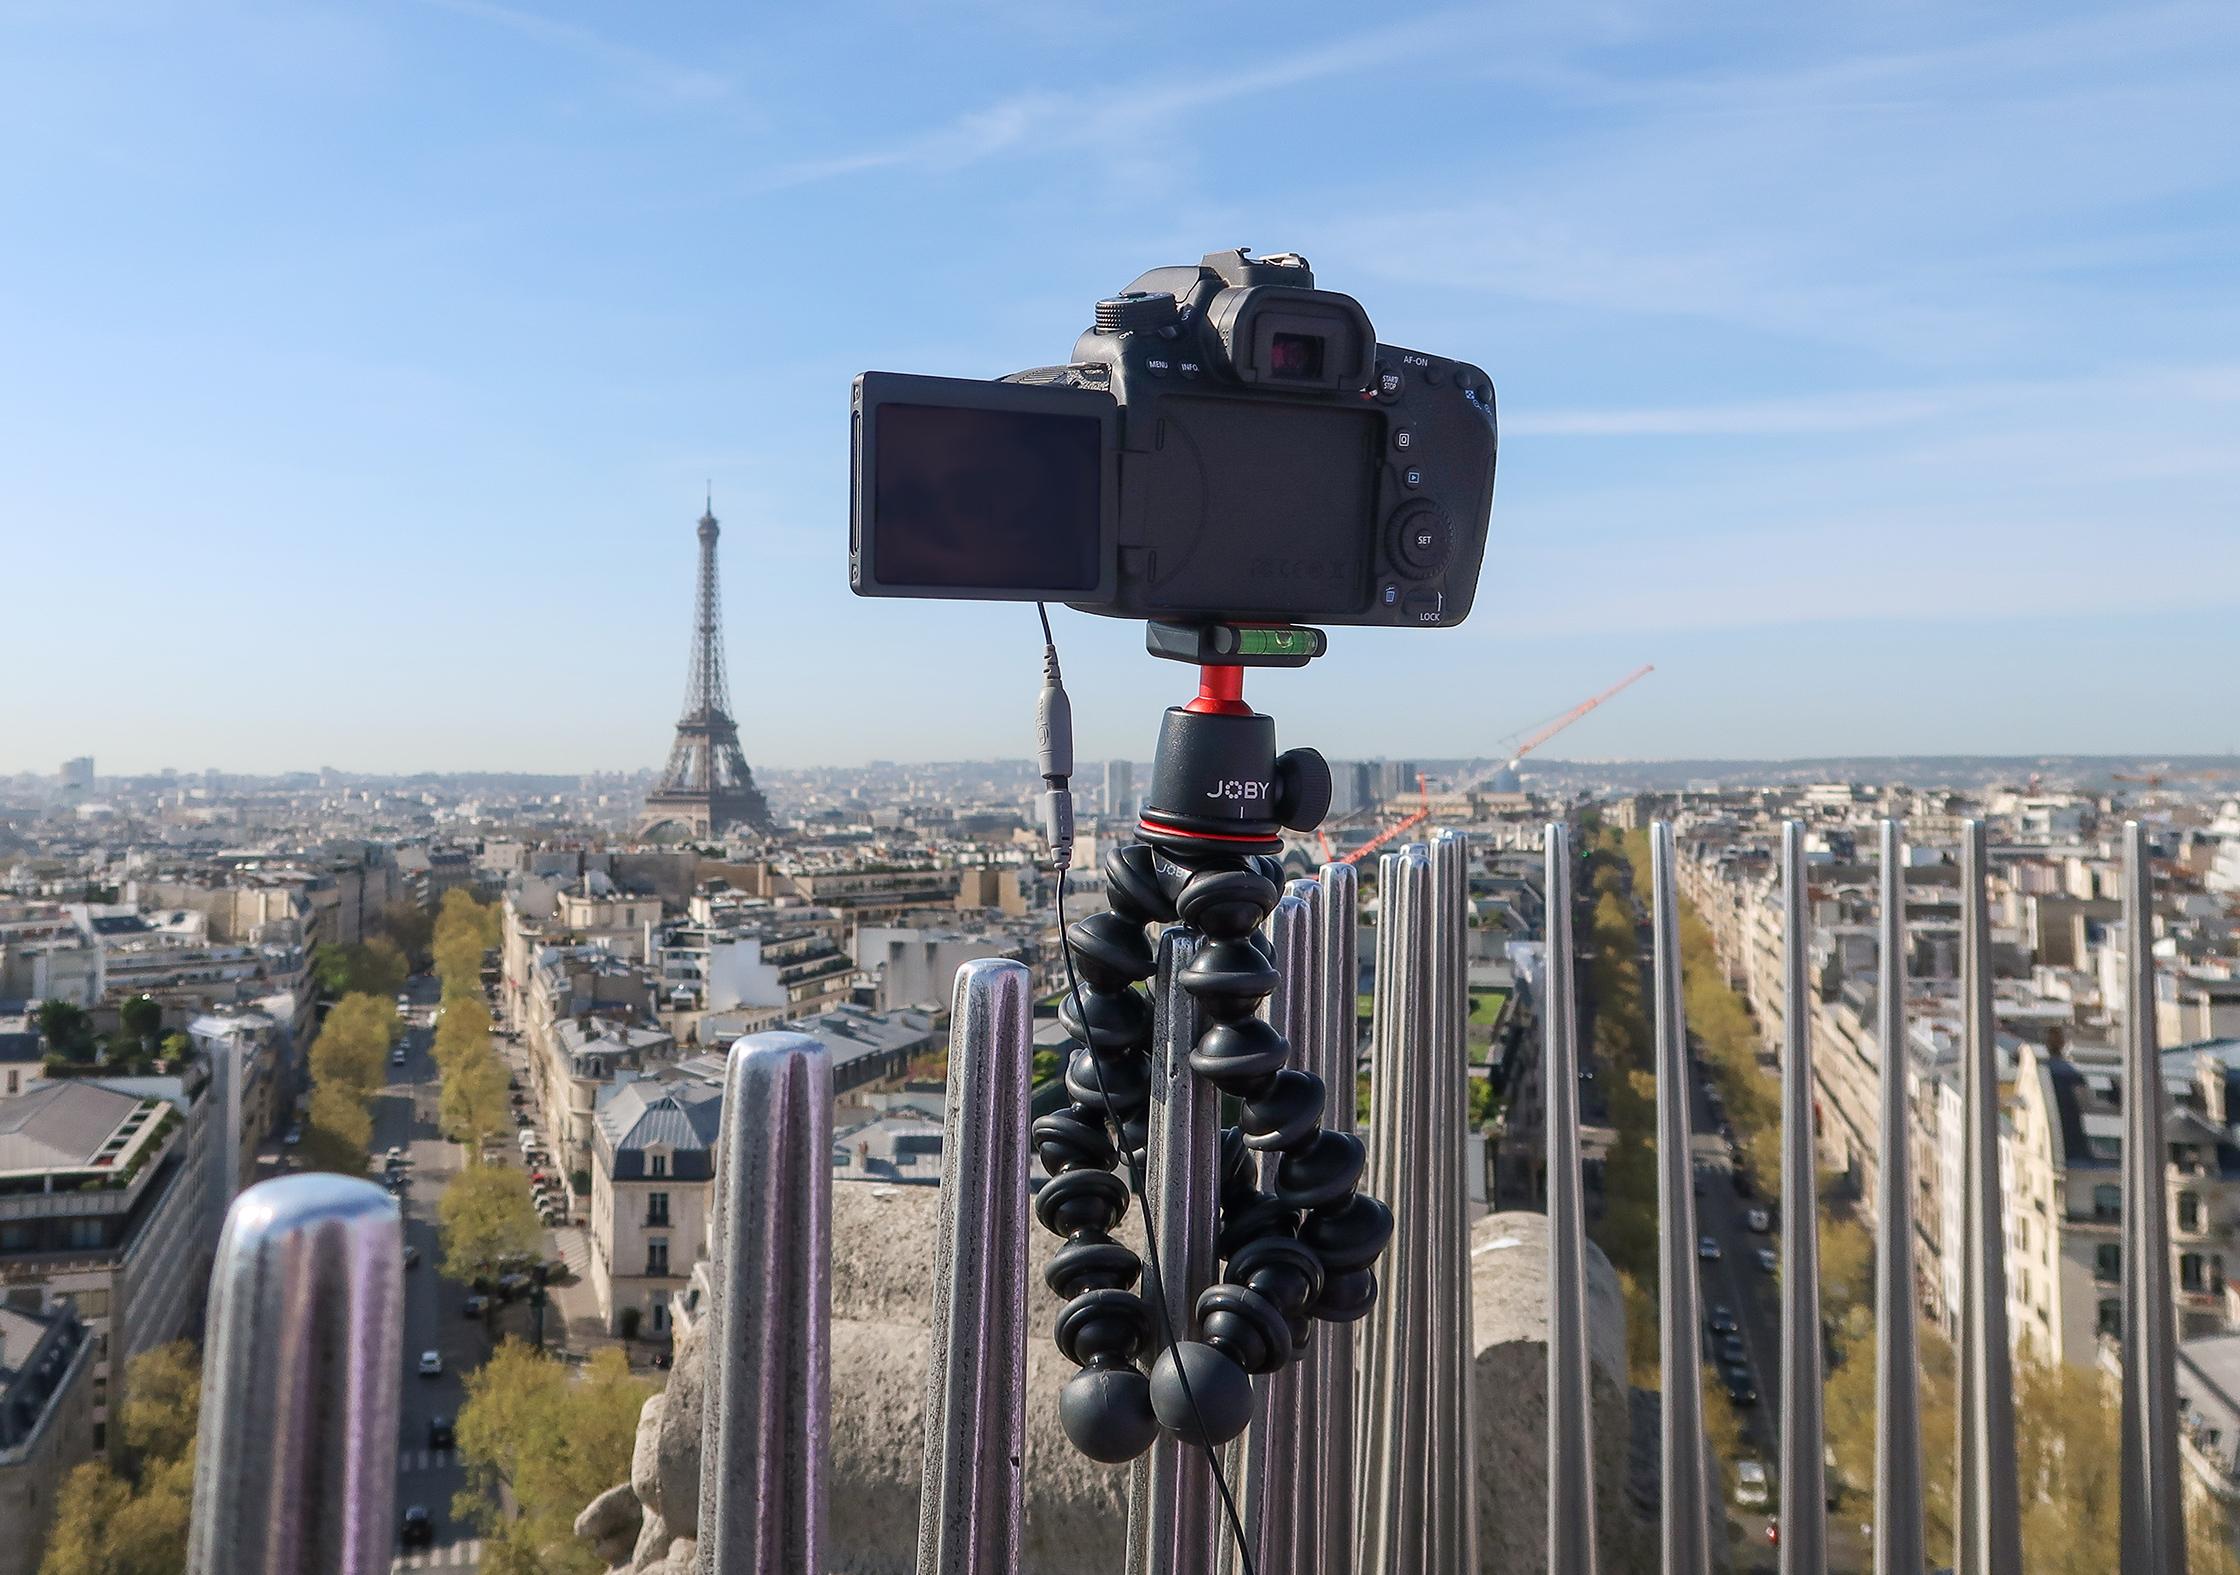 JOBY GorillaPod 3K On Top Of The Arc De Triomphe In Paris, France 2